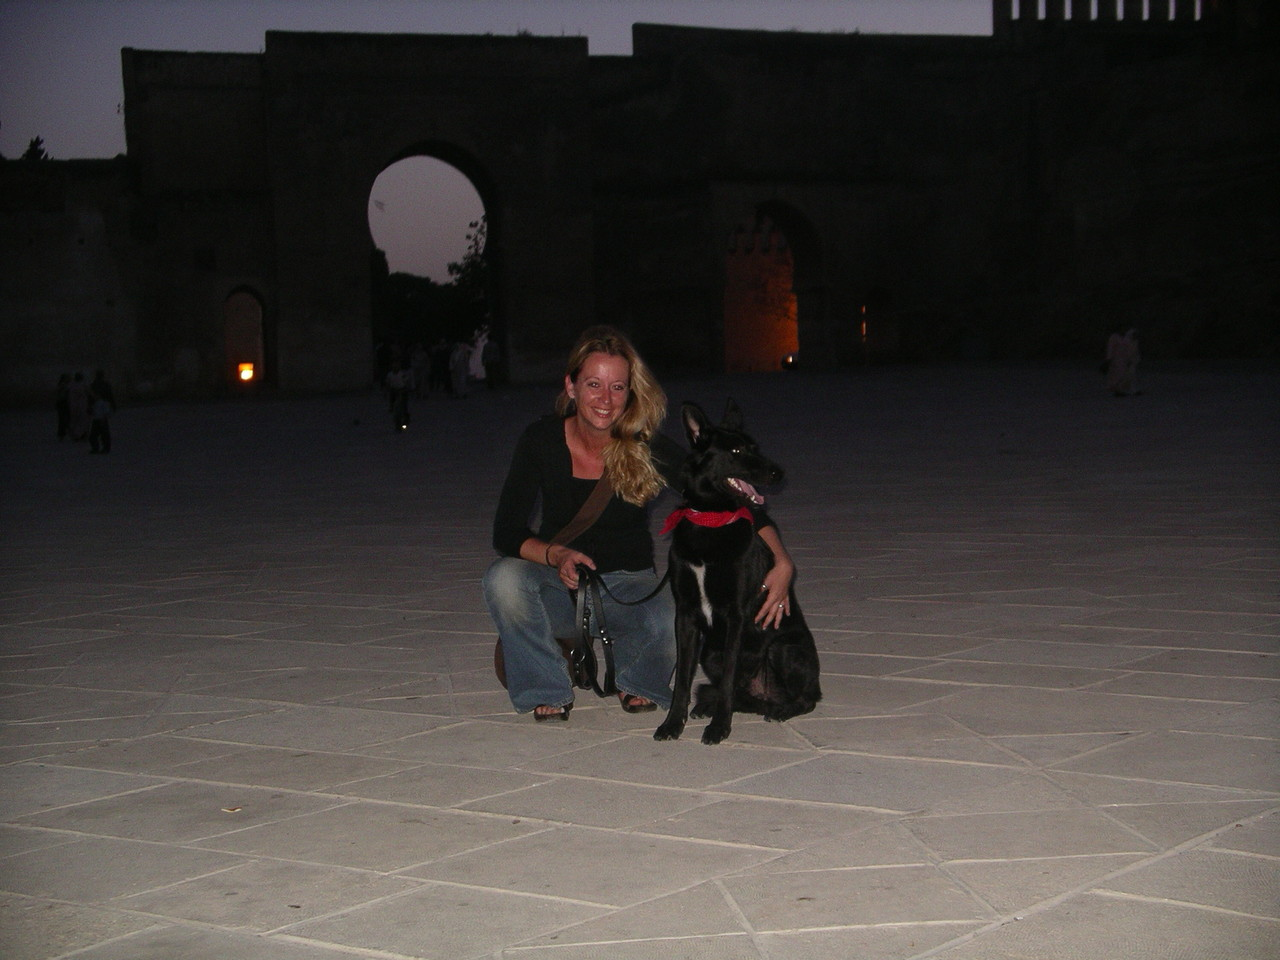 MAROKKO 2004